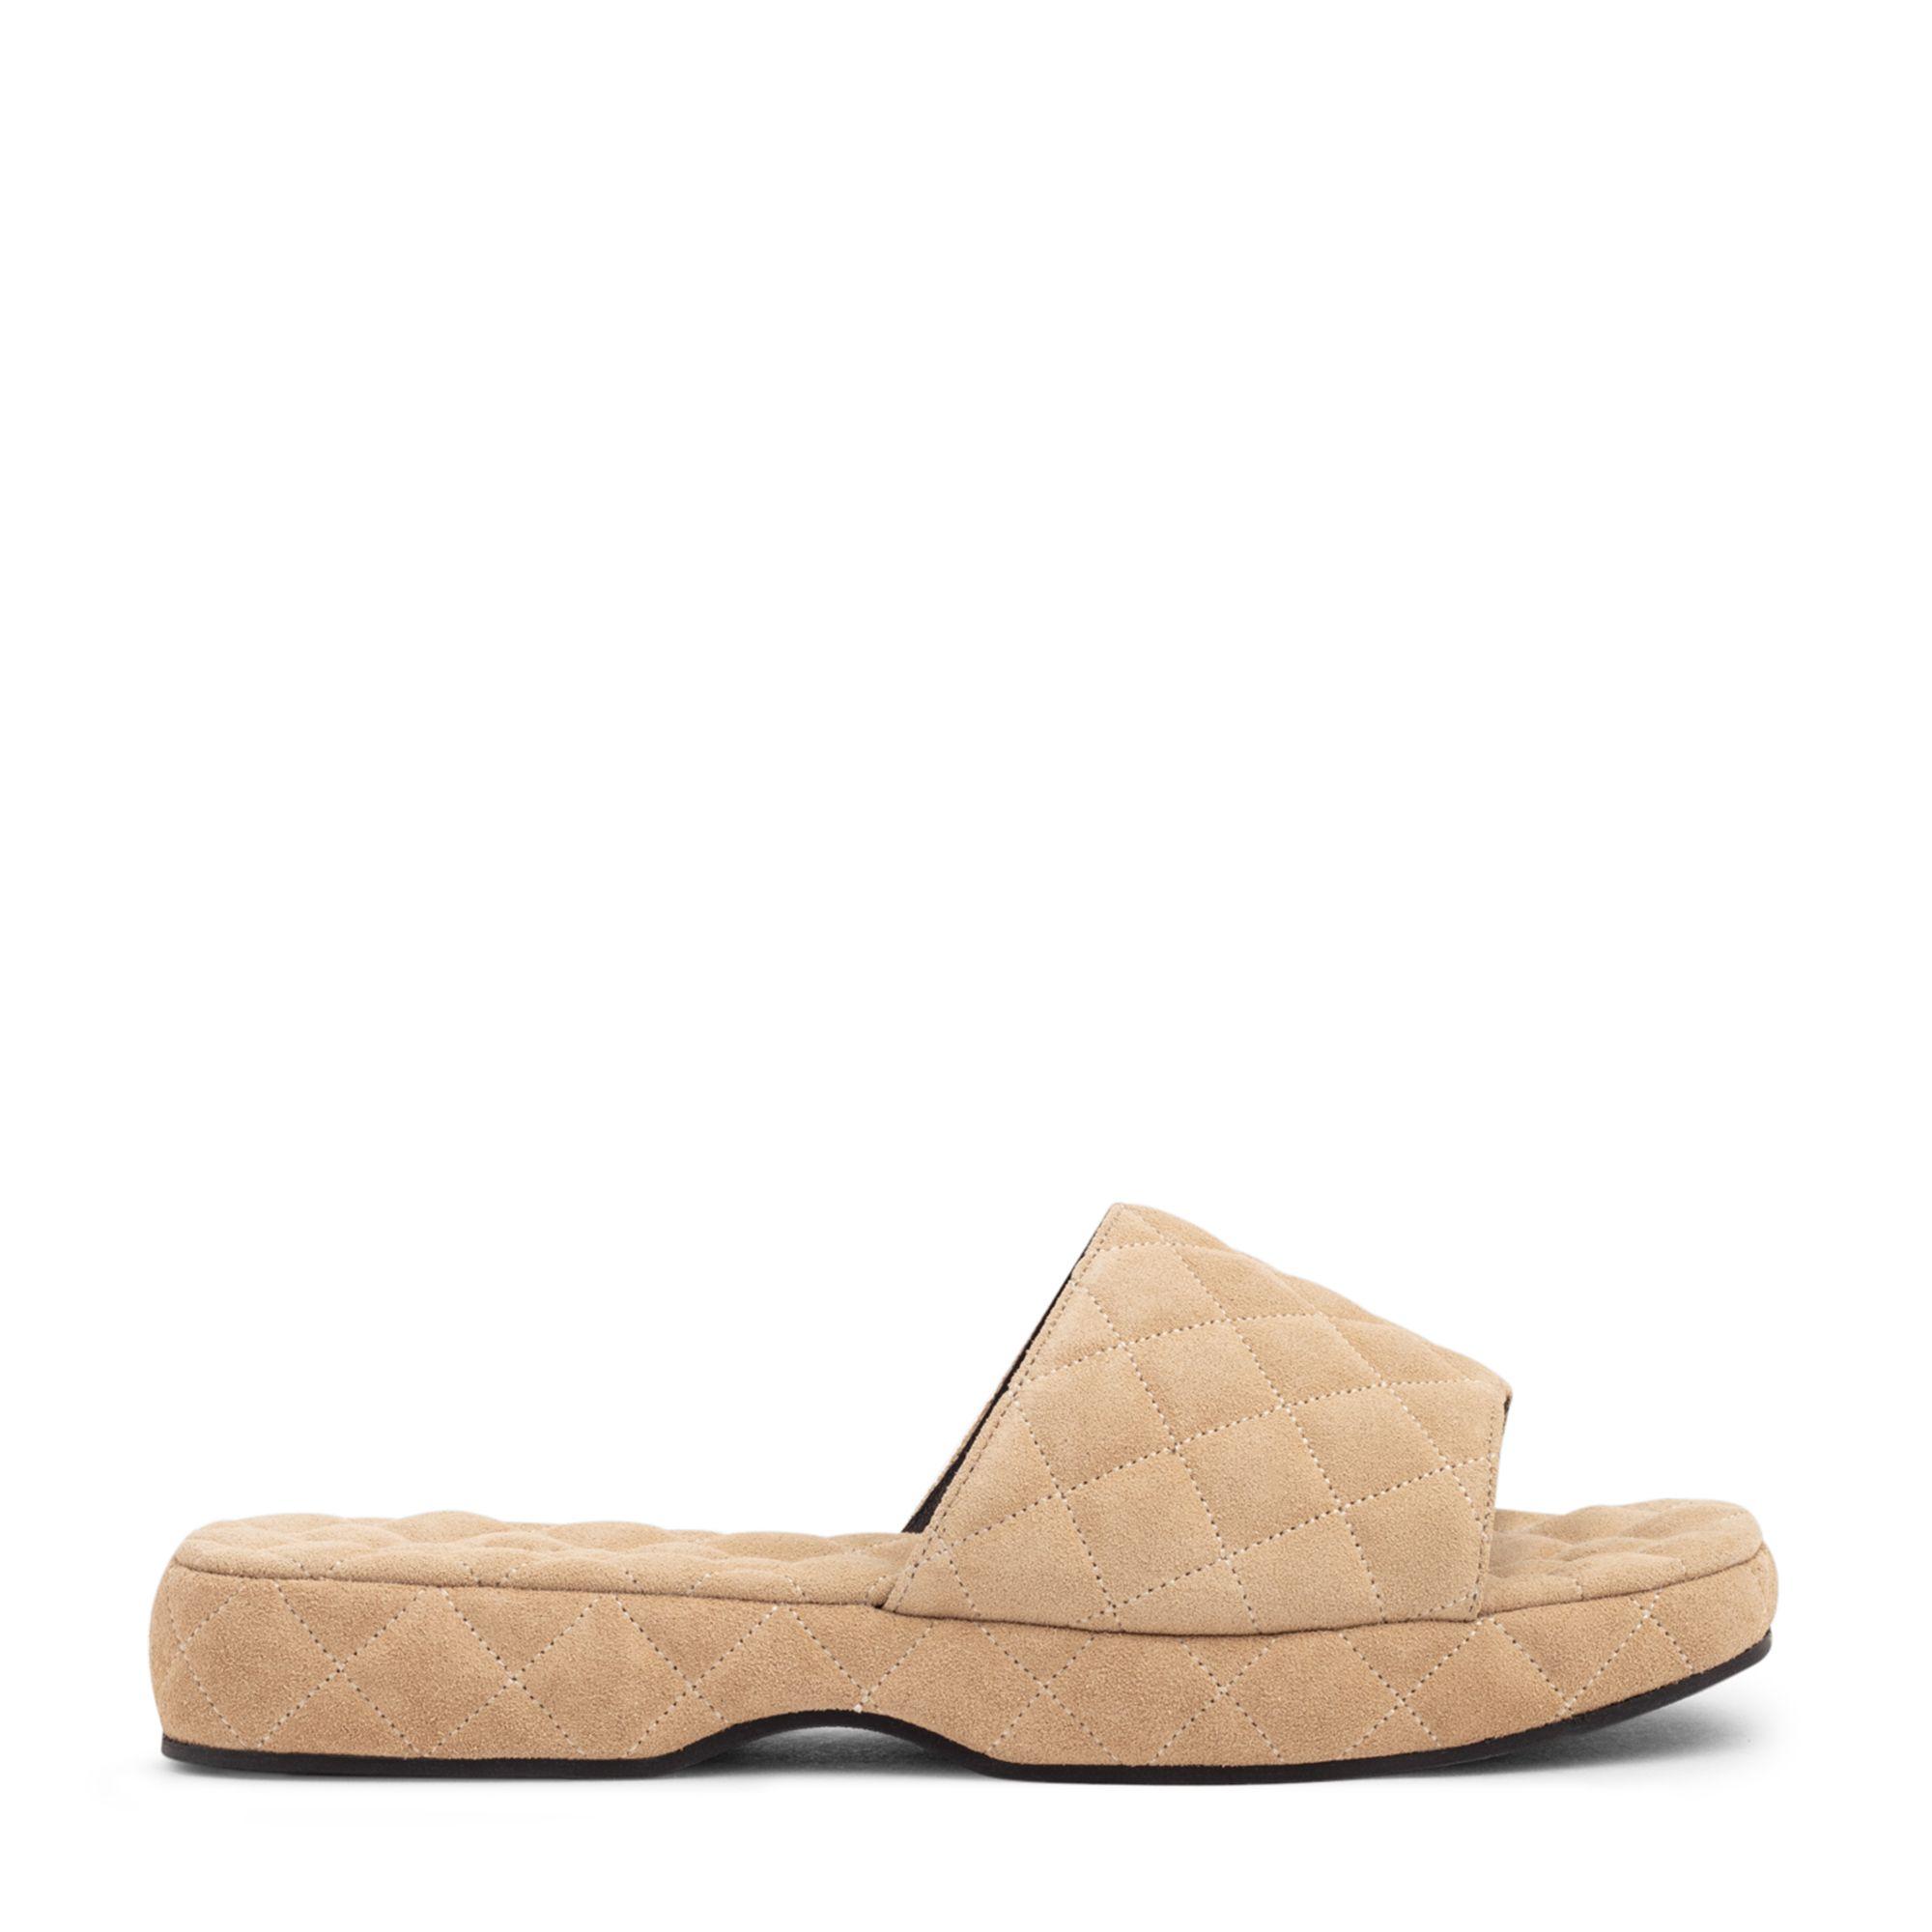 Lilo flat sandals